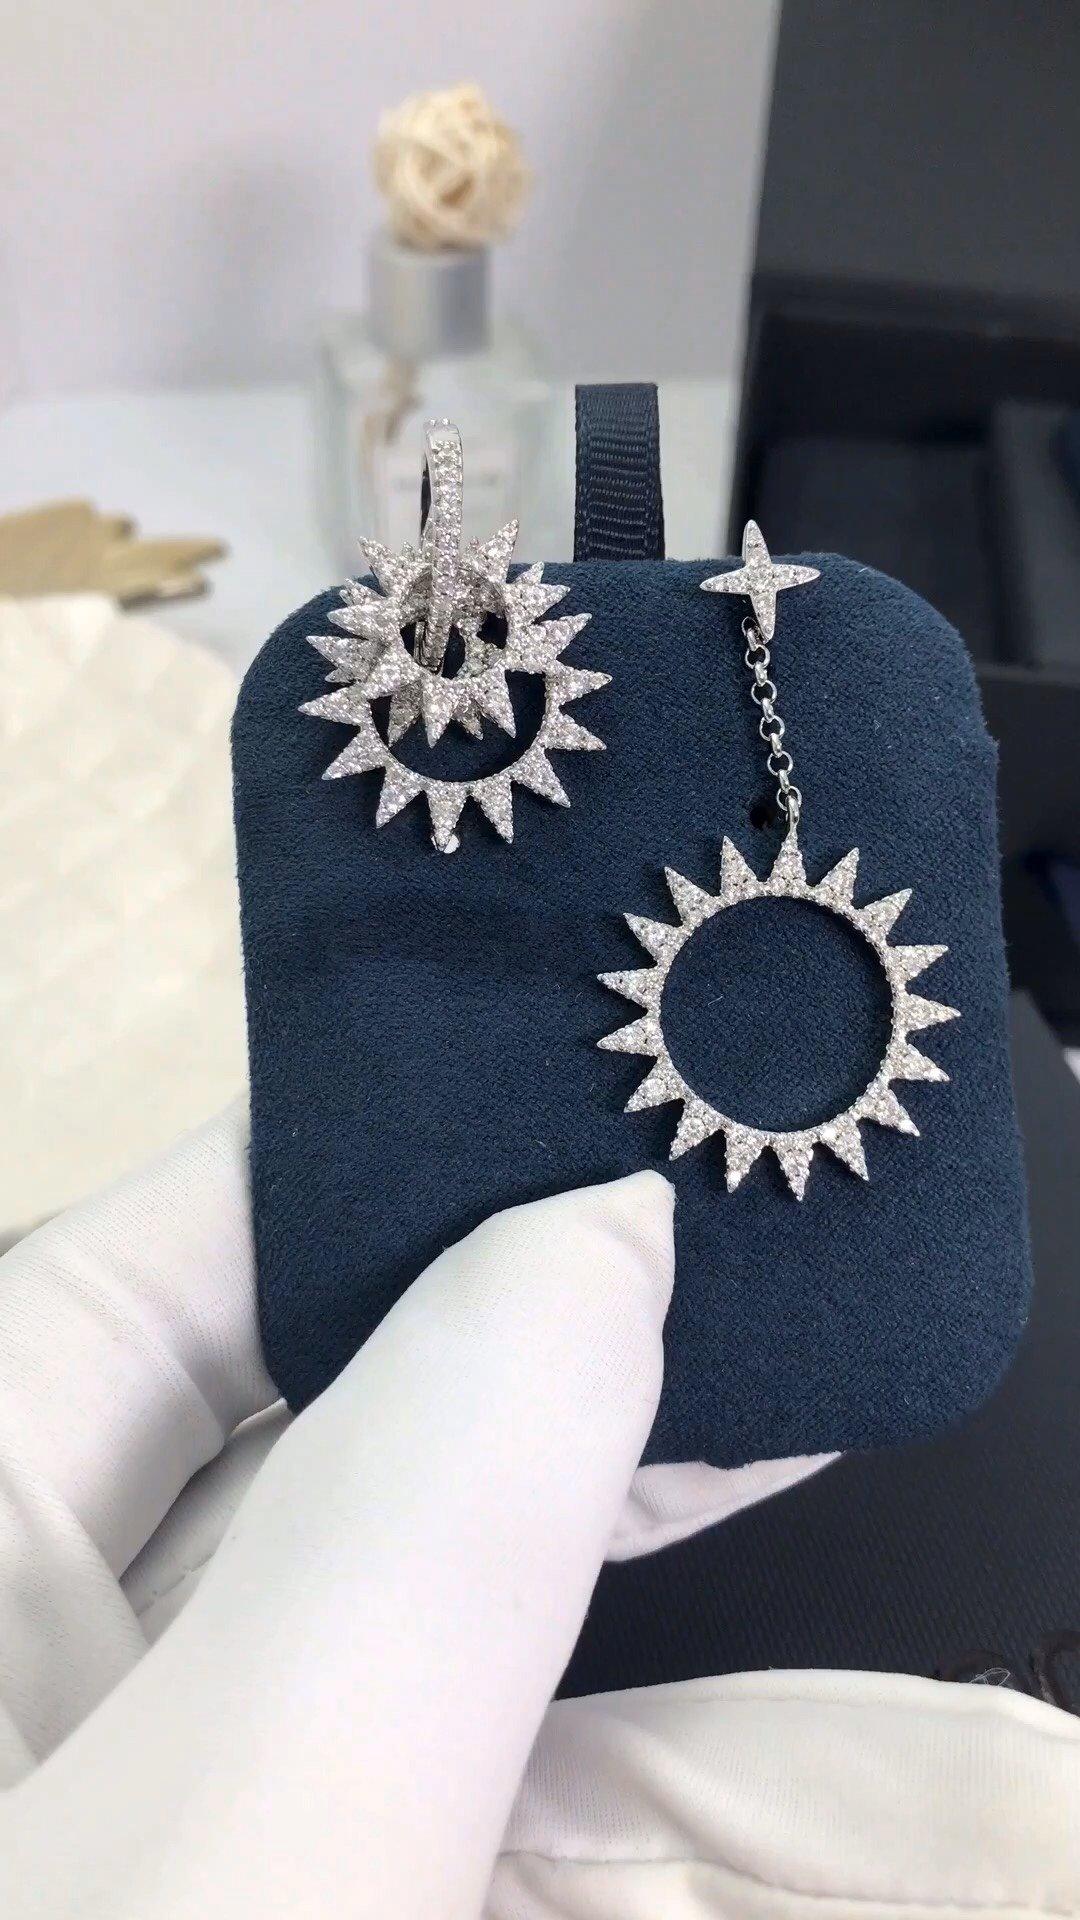 Apm monaco 高品质??Apmmonaco短款银色齿轮??耳环!巴洛克风齿轮造型耳环,多个齿轮圈的设计,又有点像太阳??,美到...